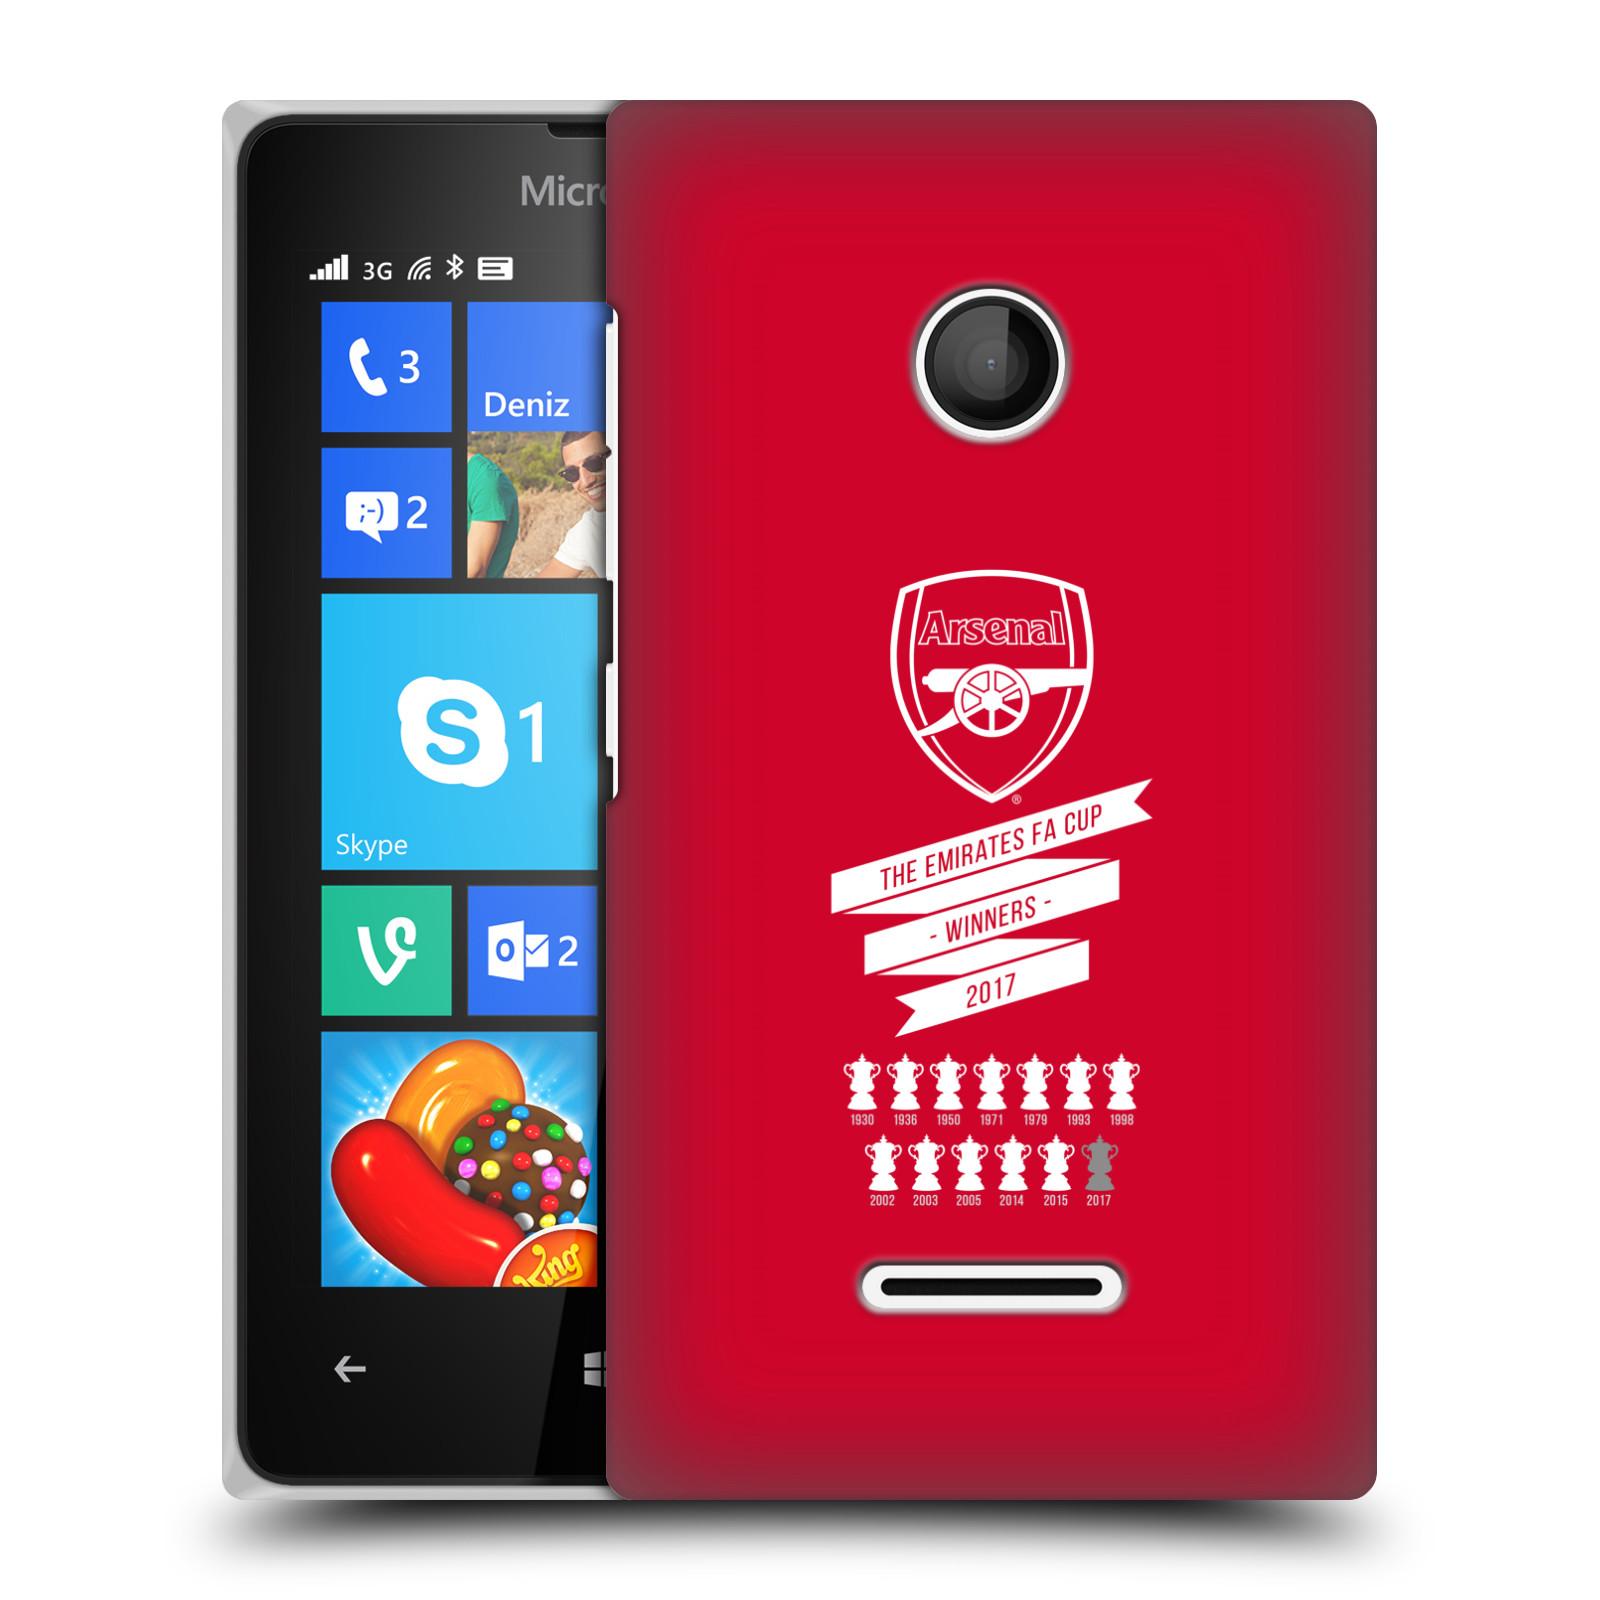 Plastové pouzdro na mobil Microsoft Lumia 435 - Head Case - Arsenal FC - 13 Wins